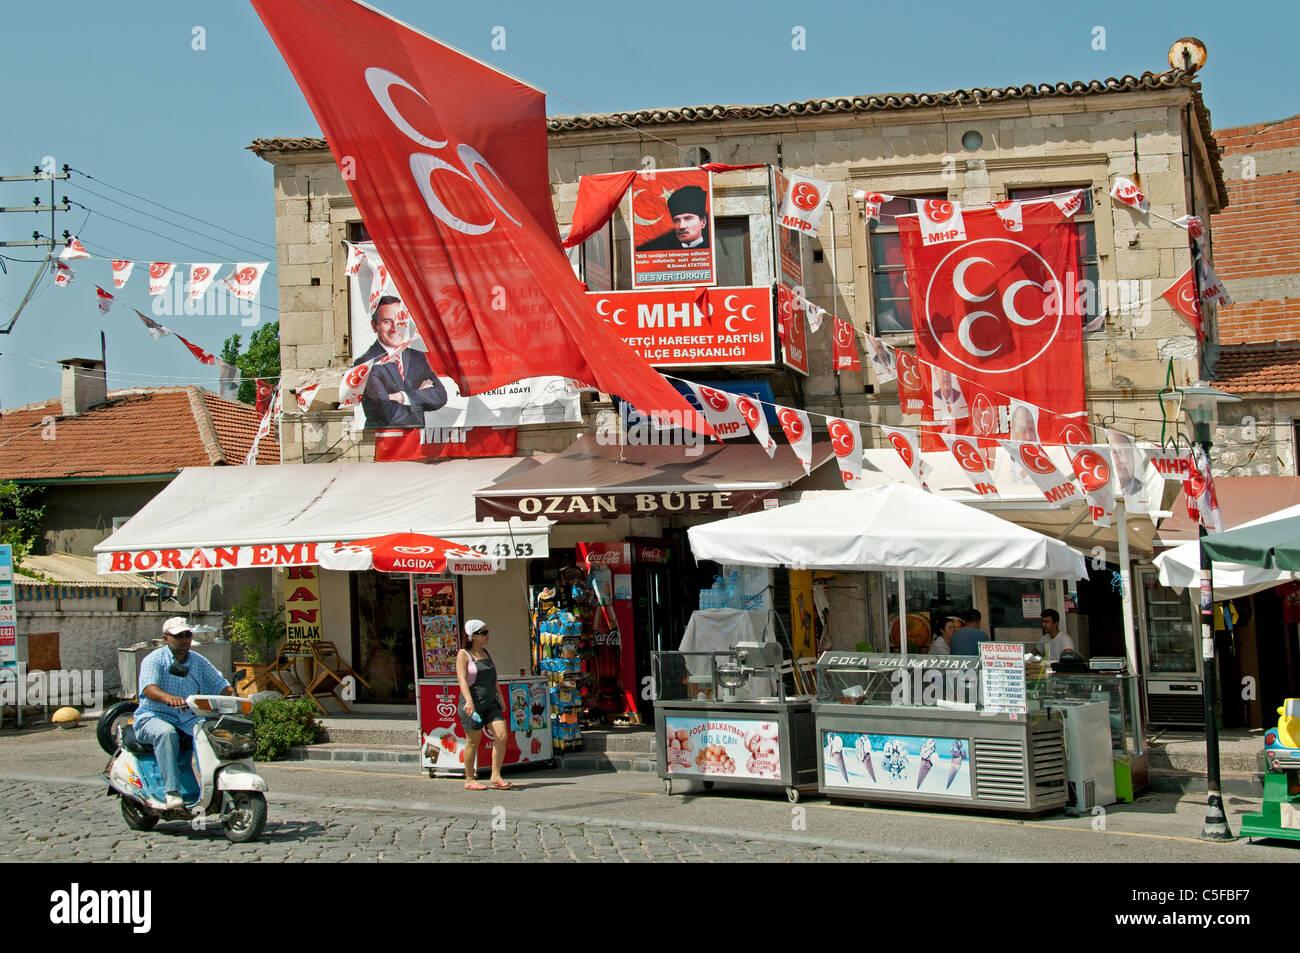 Foca poll polls Port Harbor Izmir Turkey restaurant - Stock Image